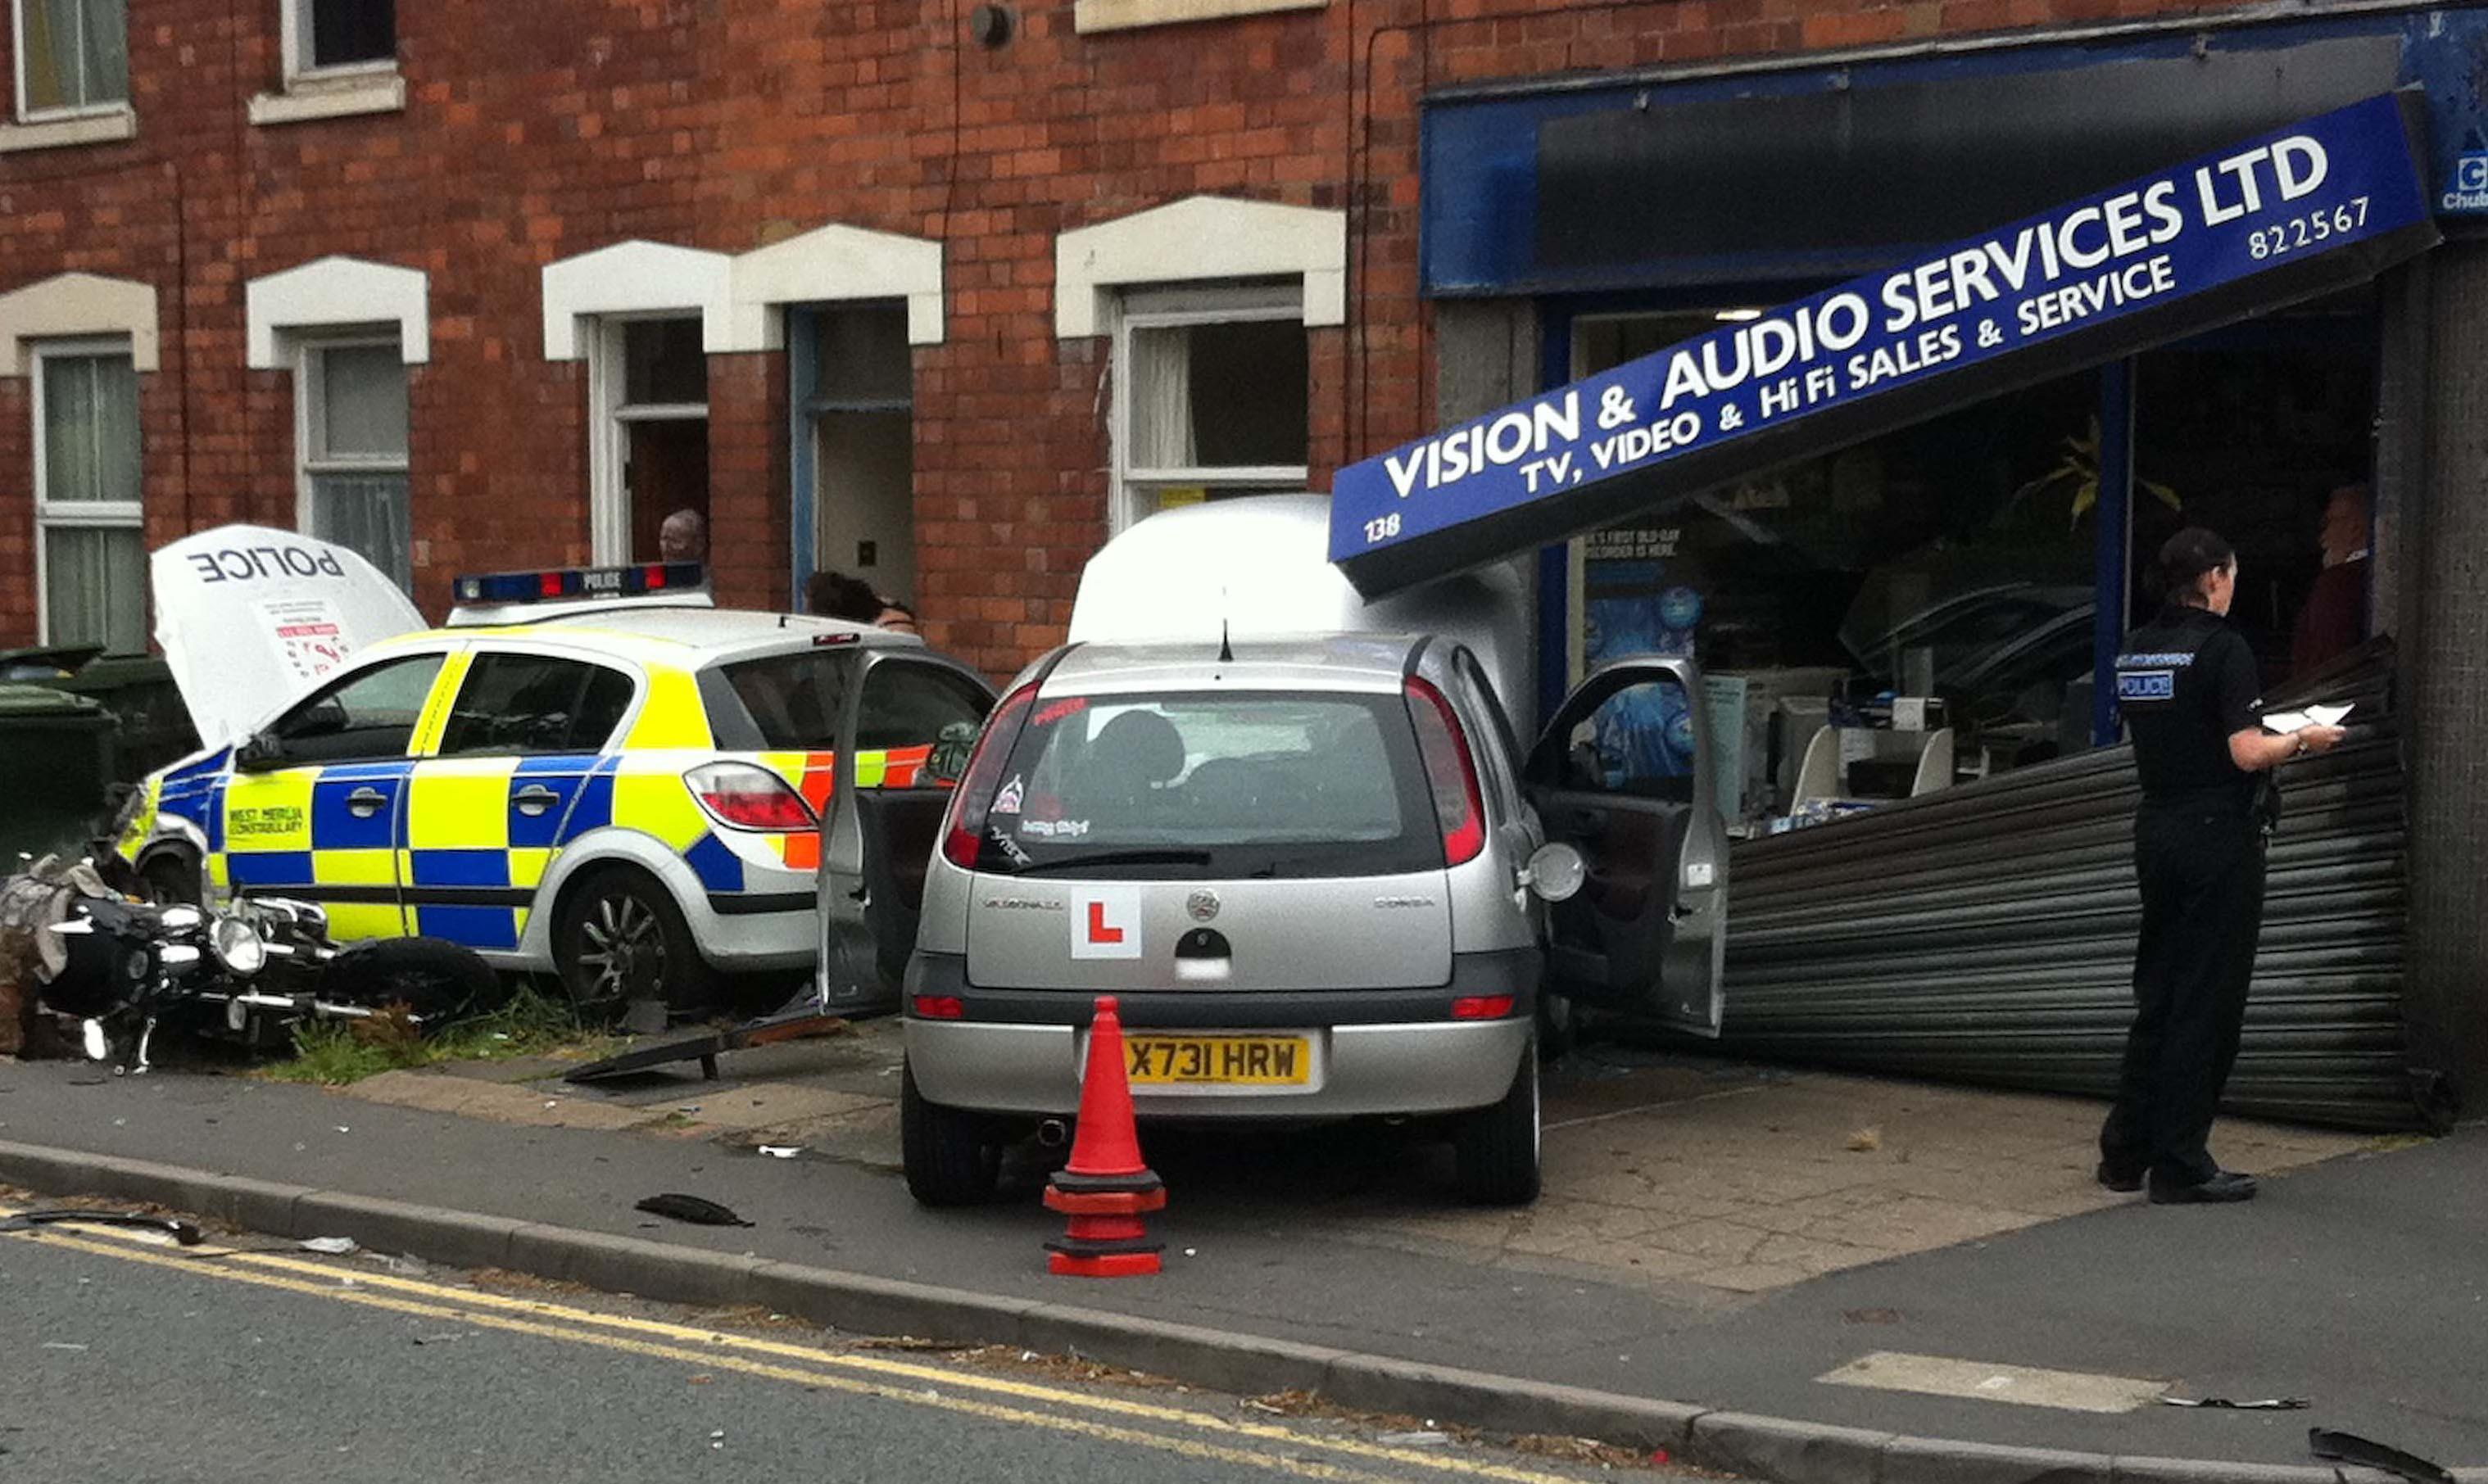 Police car crashes into shop front